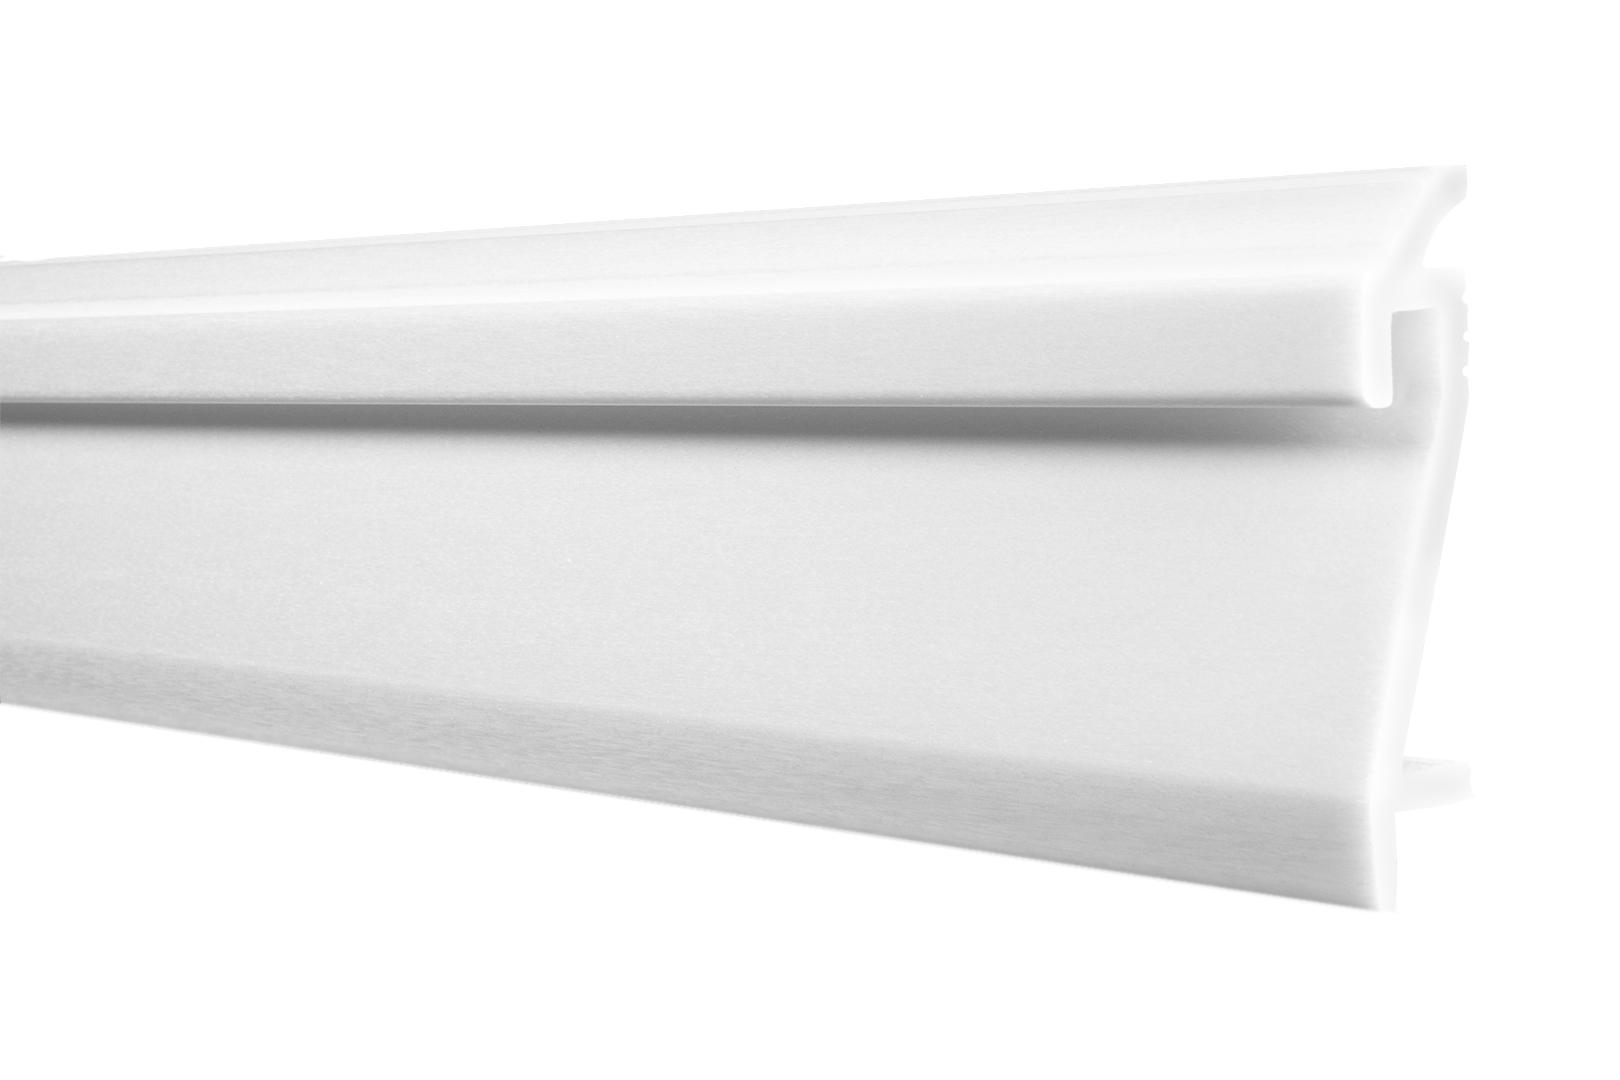 LED Sockelleisten | Stuck | Fußleiste | Berliner | stoßfest | 109x22mm | HF-3